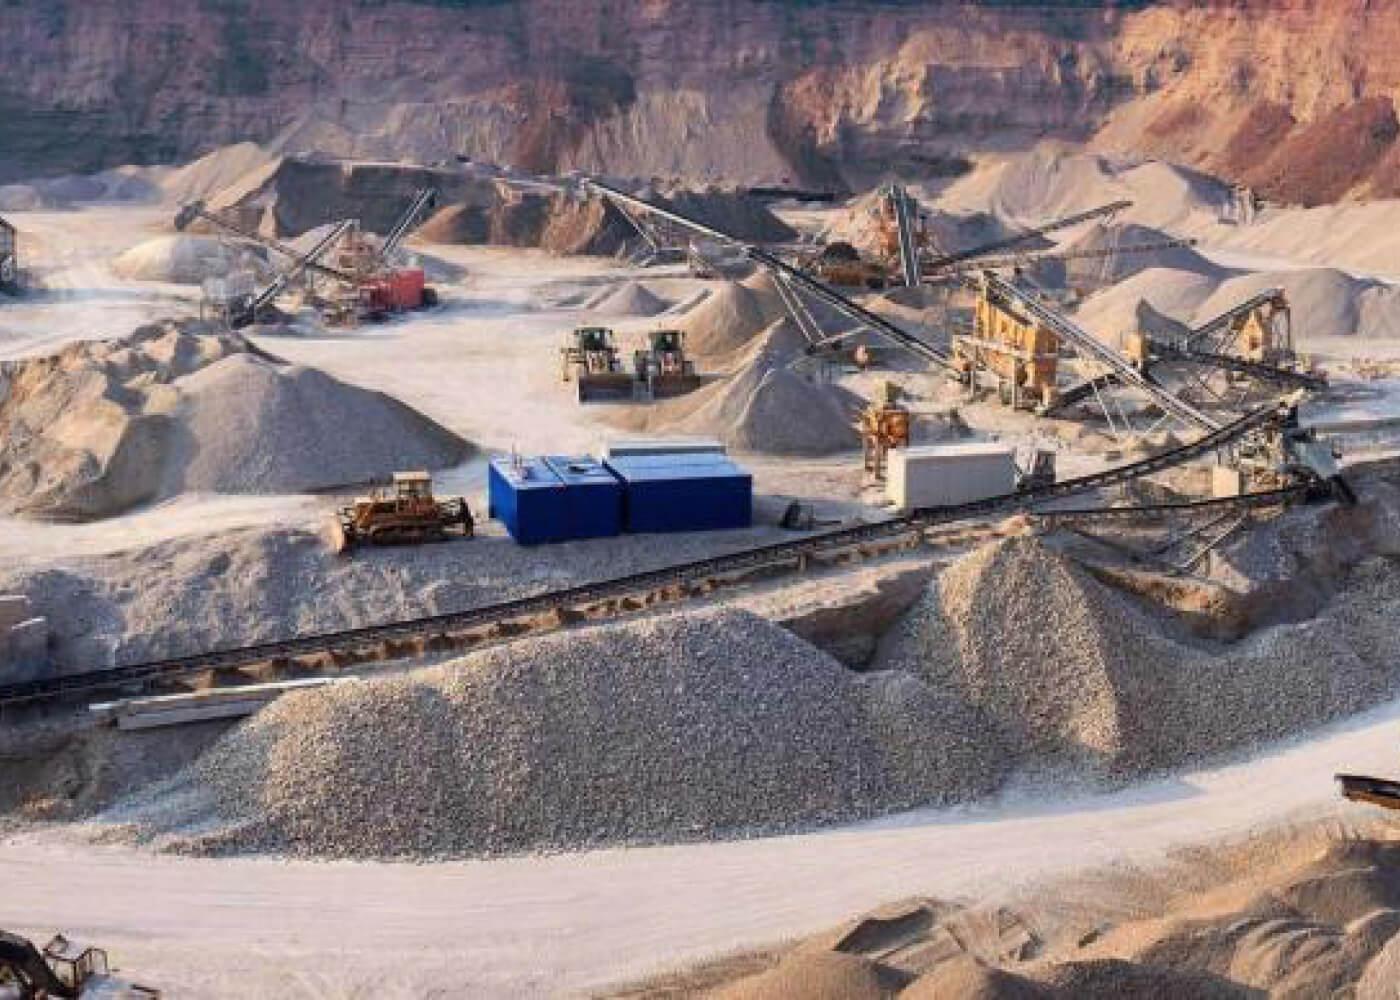 Mining & Quarry work